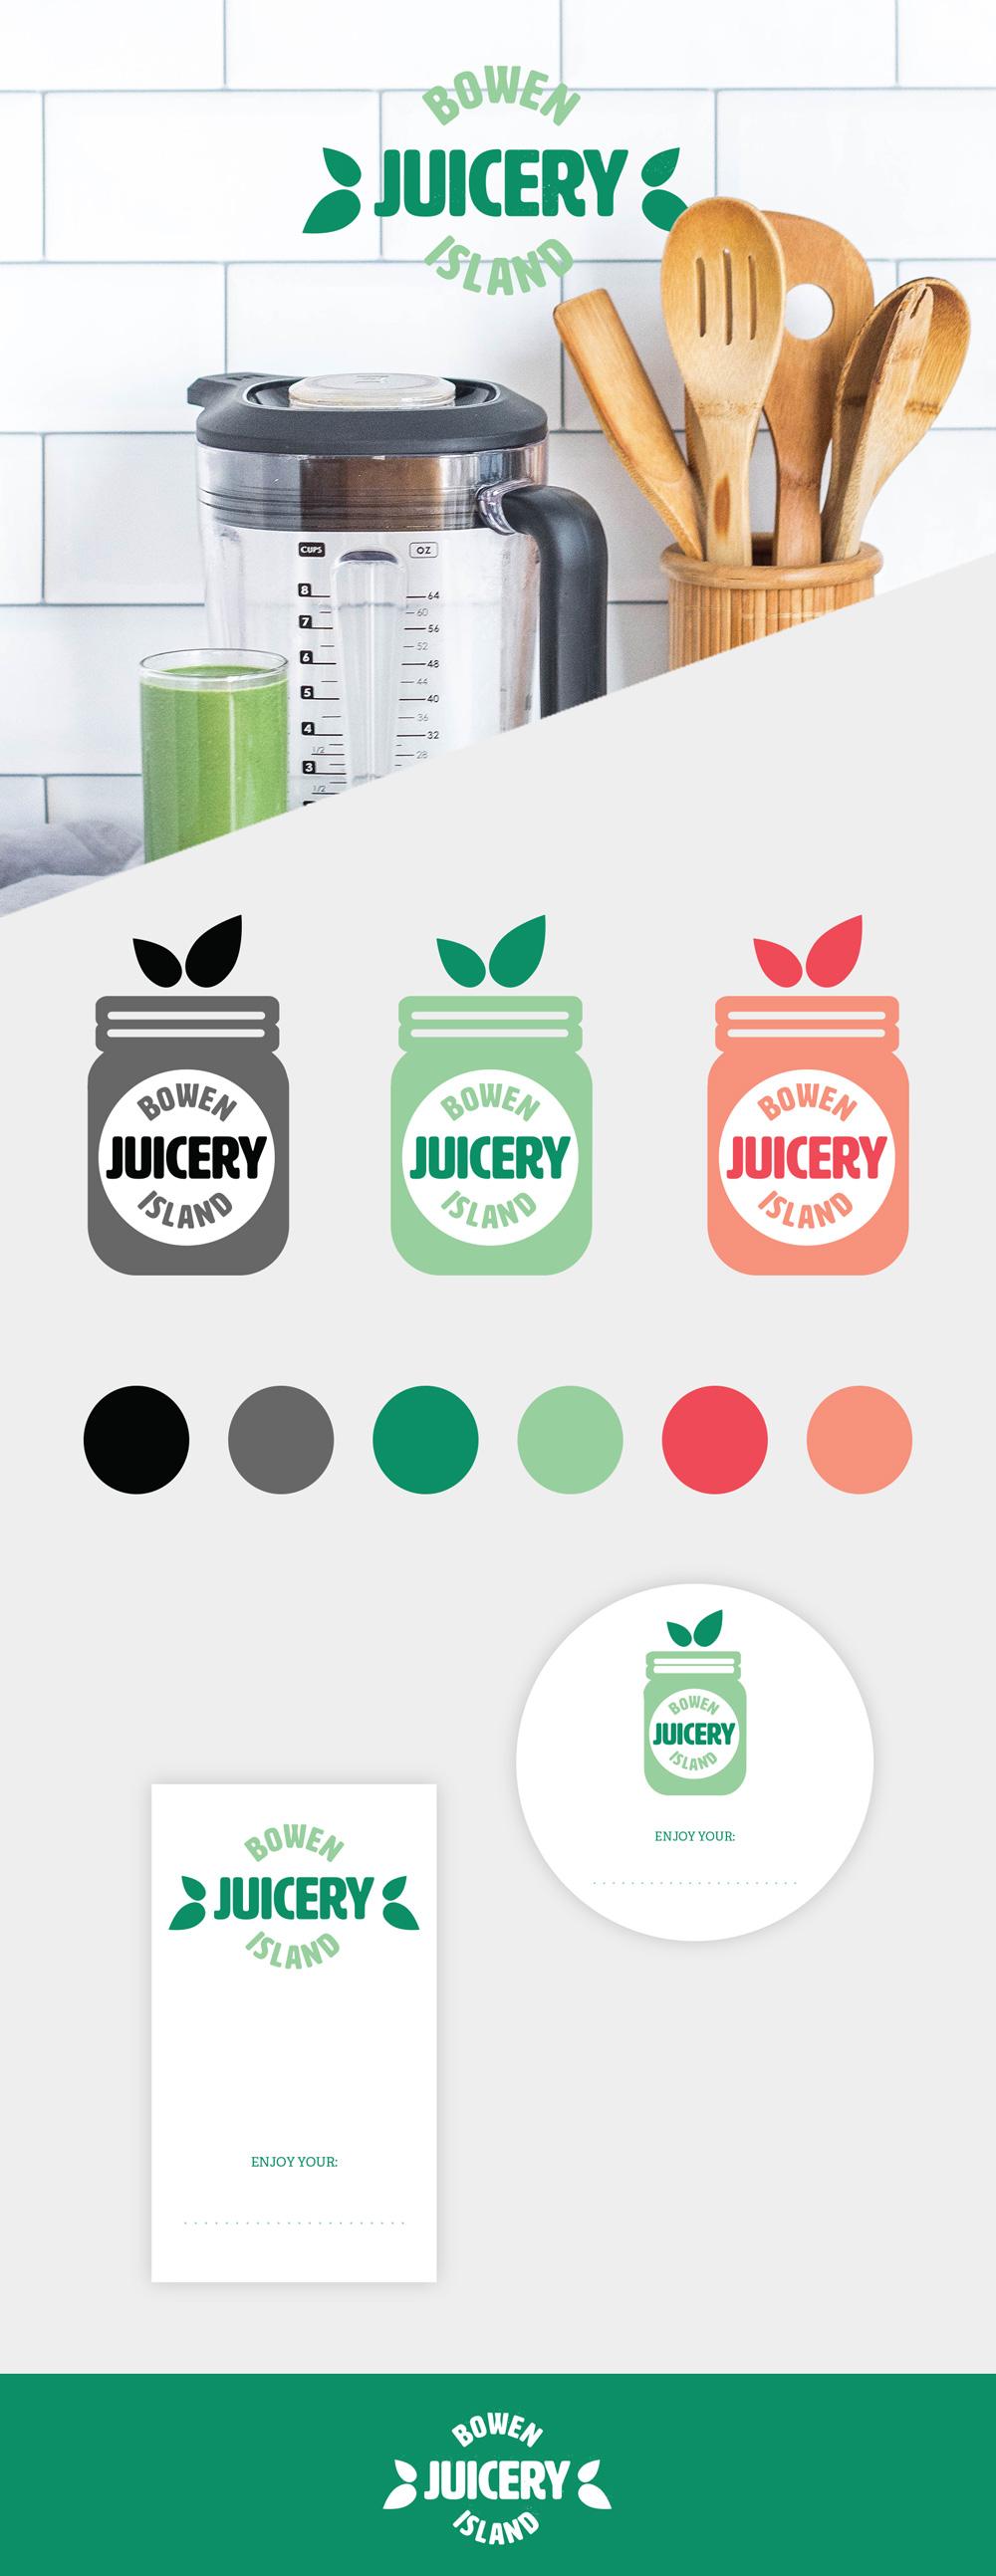 Logo design for a British Columbia juice company by Vancouver graphic designer, Jennifer Miranda Grigor //  jennifer-miranda.com